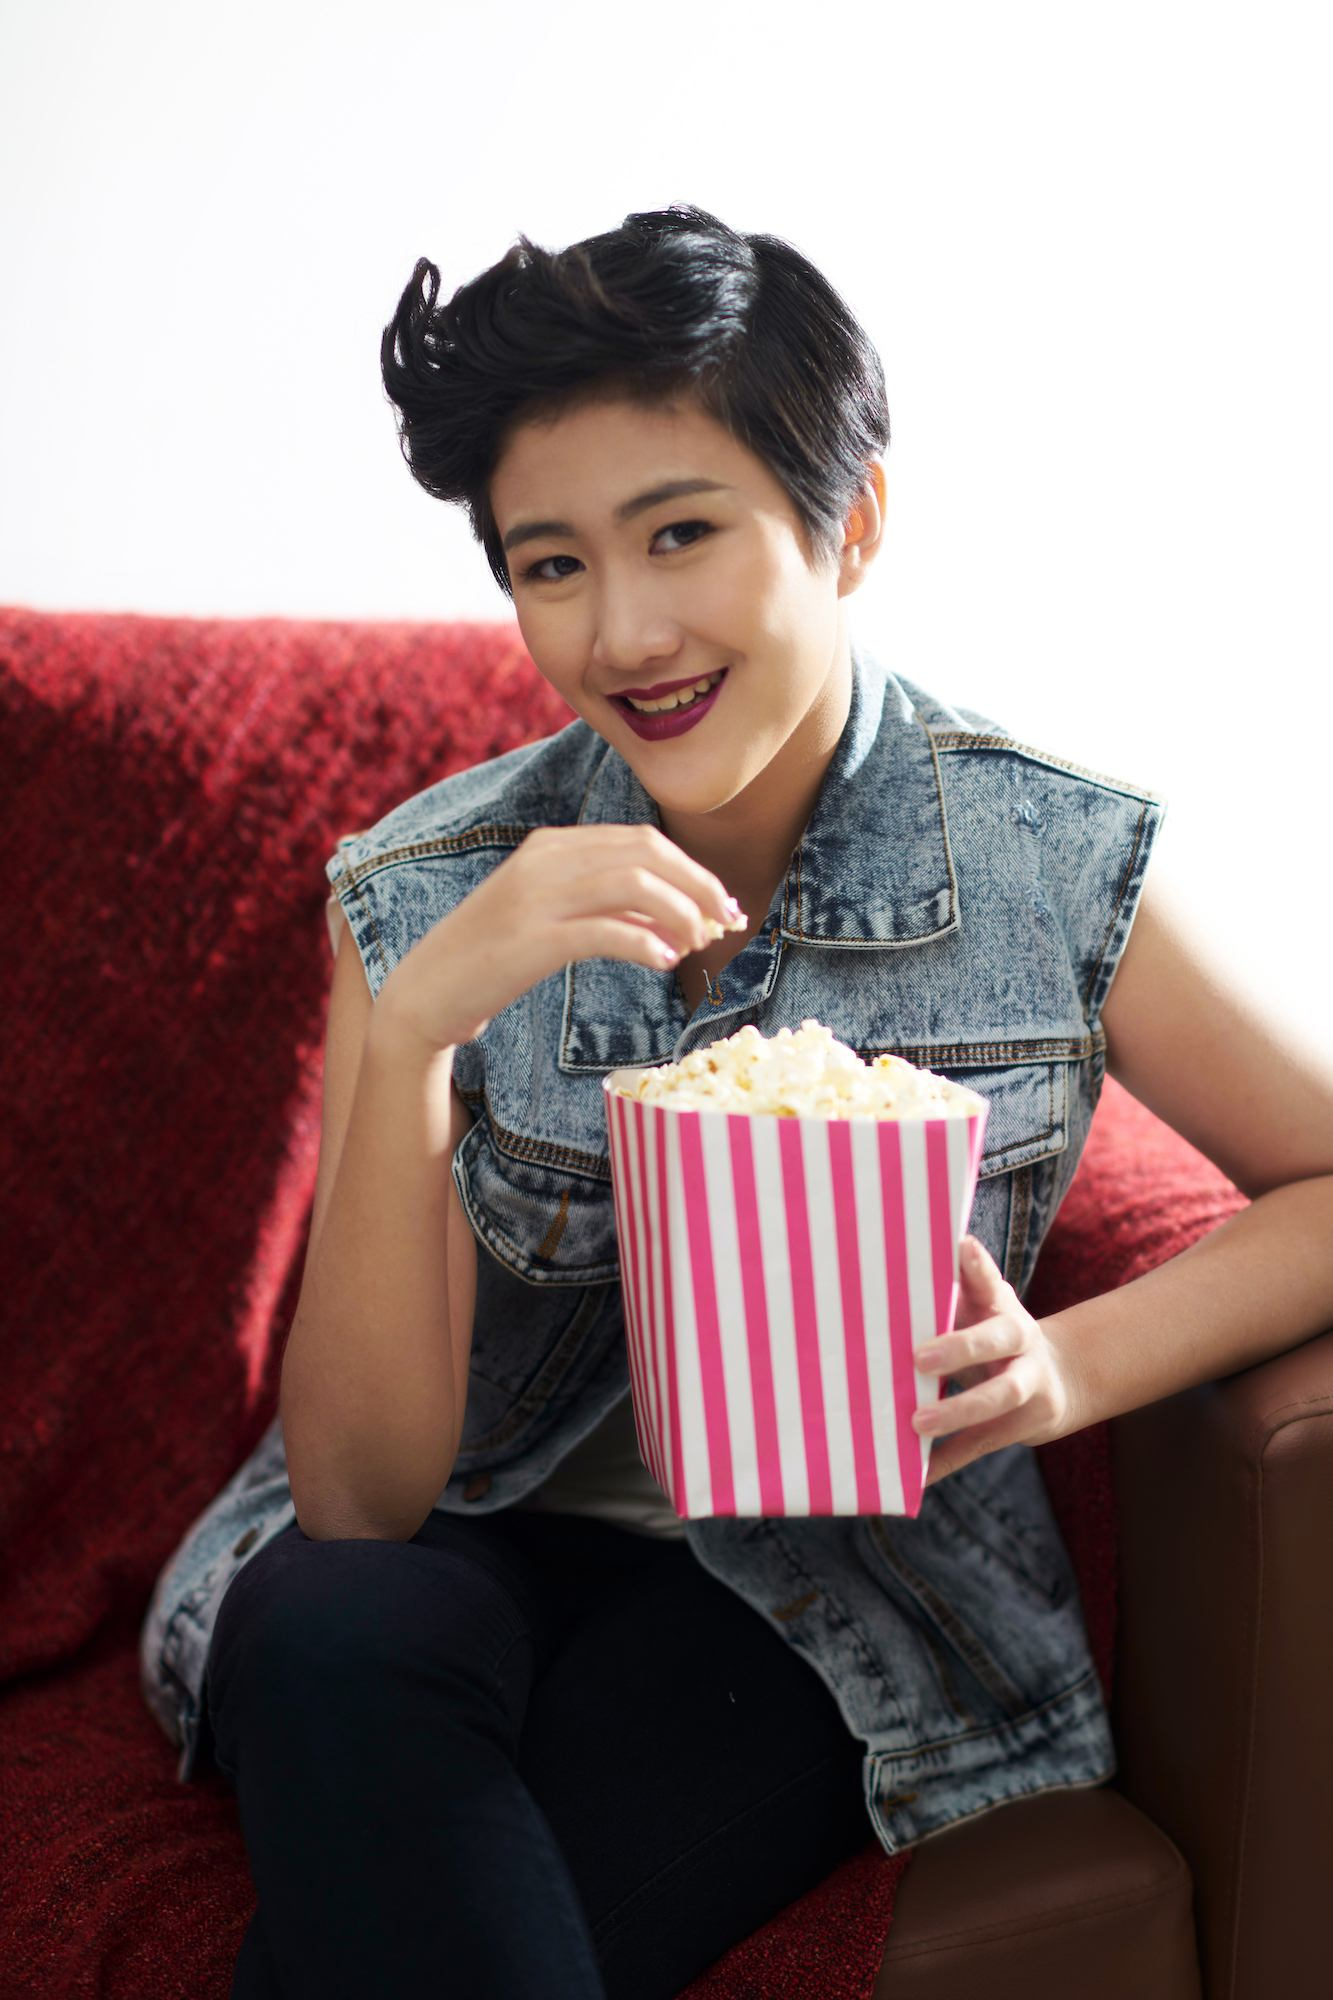 Wanita asia dengan gaya rambut long pixie cuts sedang menyantap popcorn.